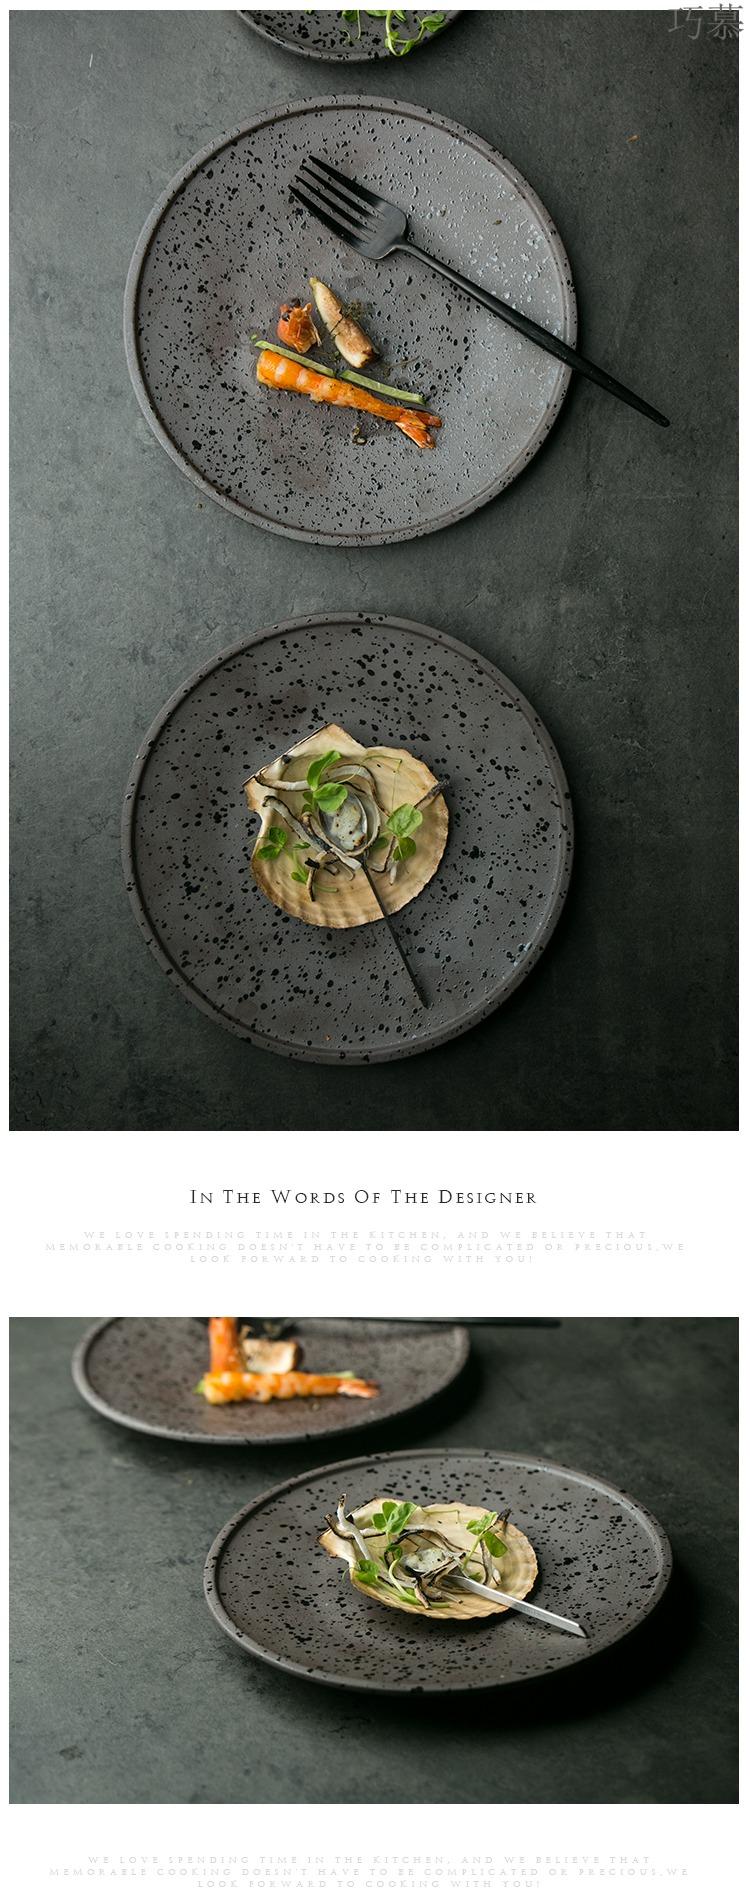 Qiao mu DY wu TaoXiaoPan creative ceramic colored tujia steak with fine TaoPan dish dish dish dish food dish